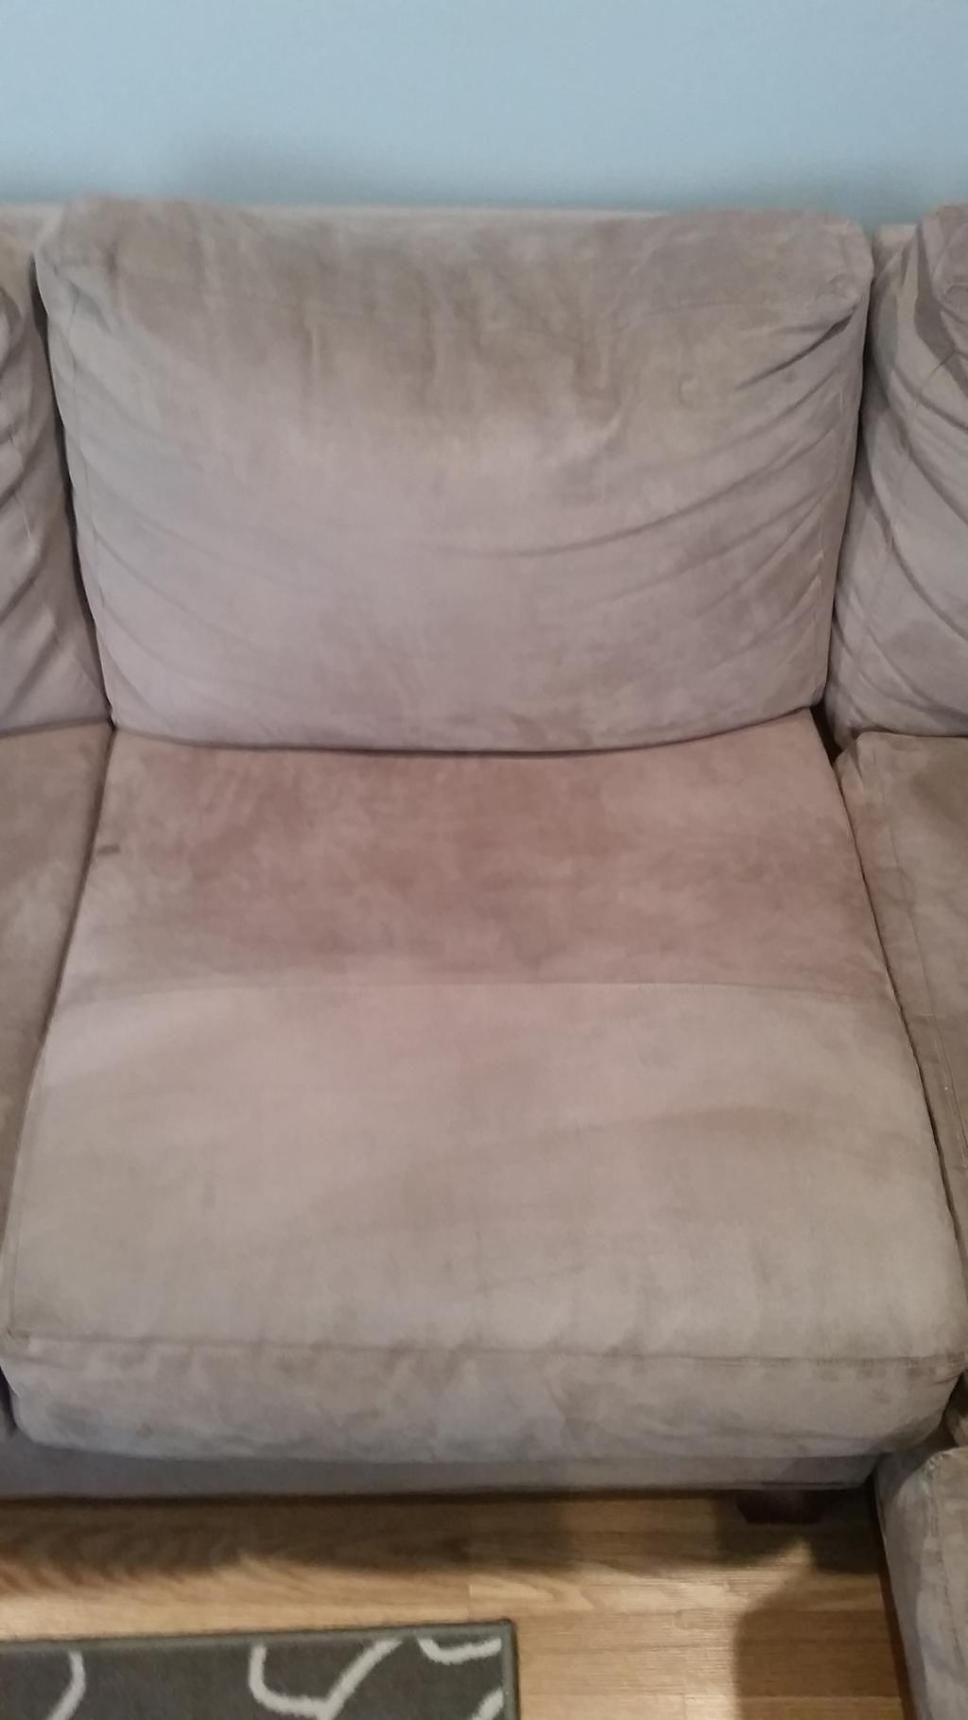 Stupendous Cleaning A Microfiber Couch Home Hacks Cleaning Inzonedesignstudio Interior Chair Design Inzonedesignstudiocom